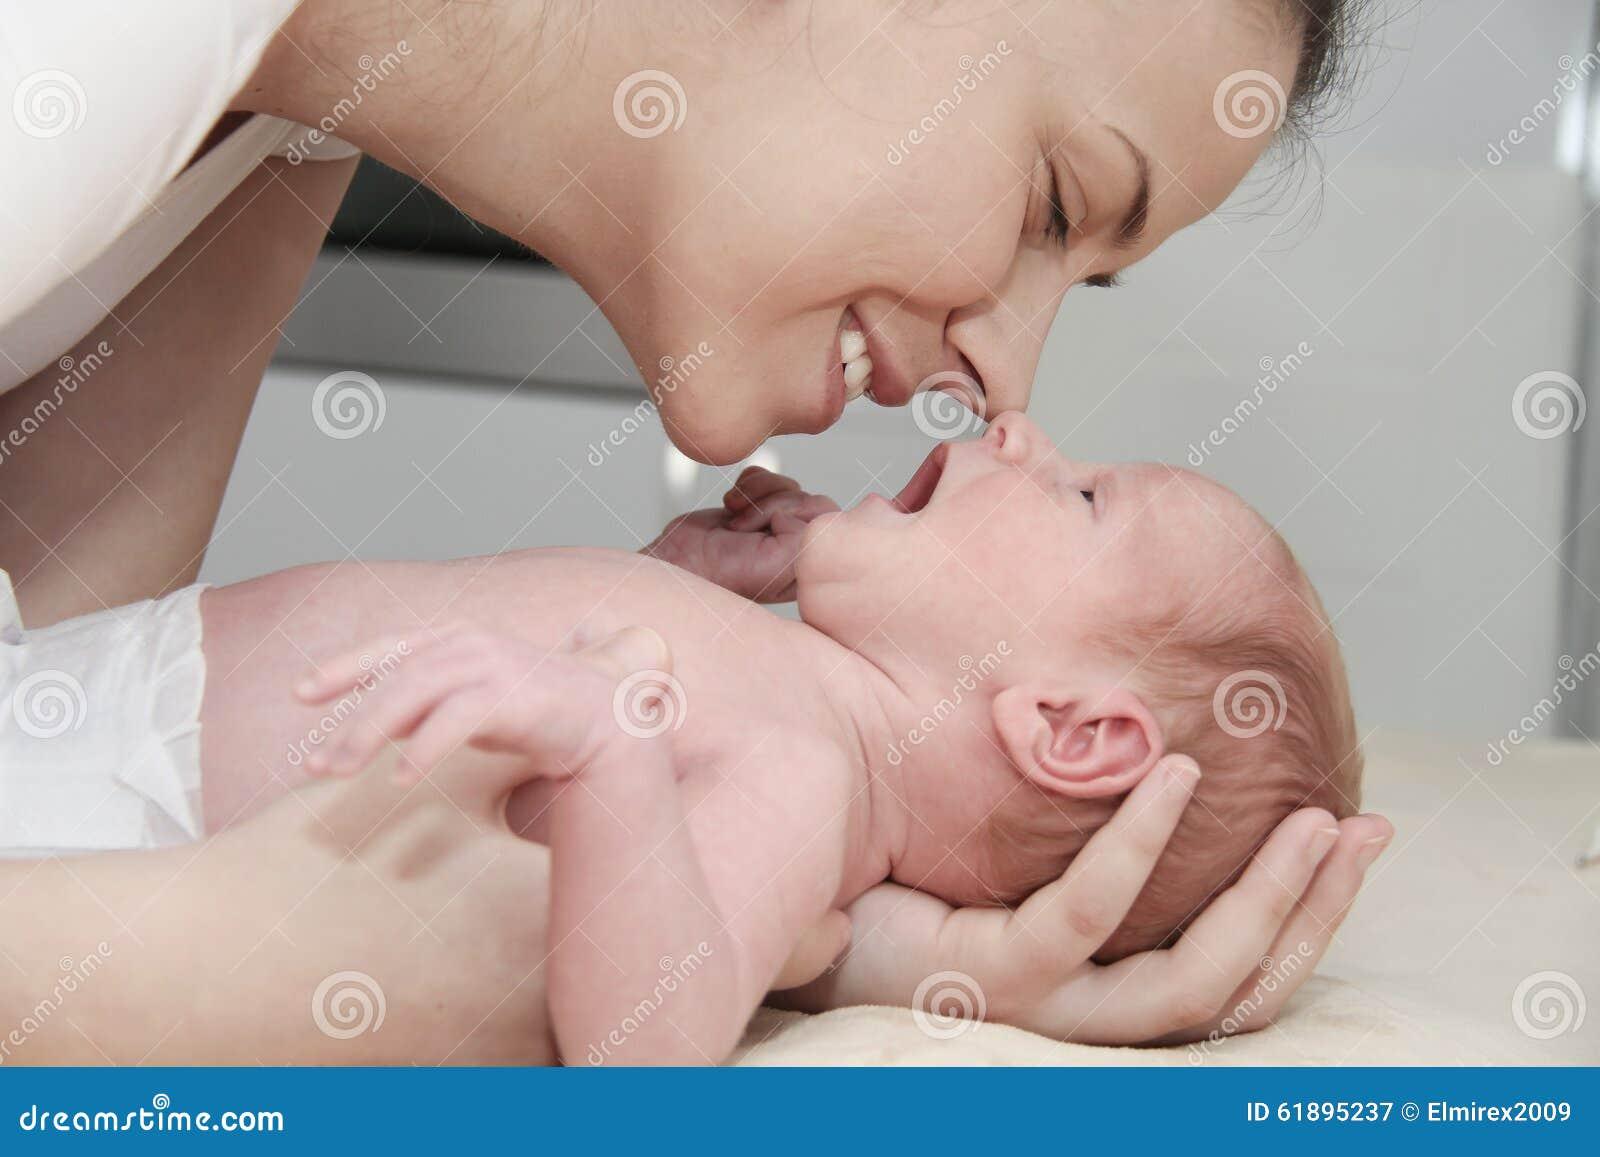 Mother and her Newborn Baby, Parent holding newborns hands